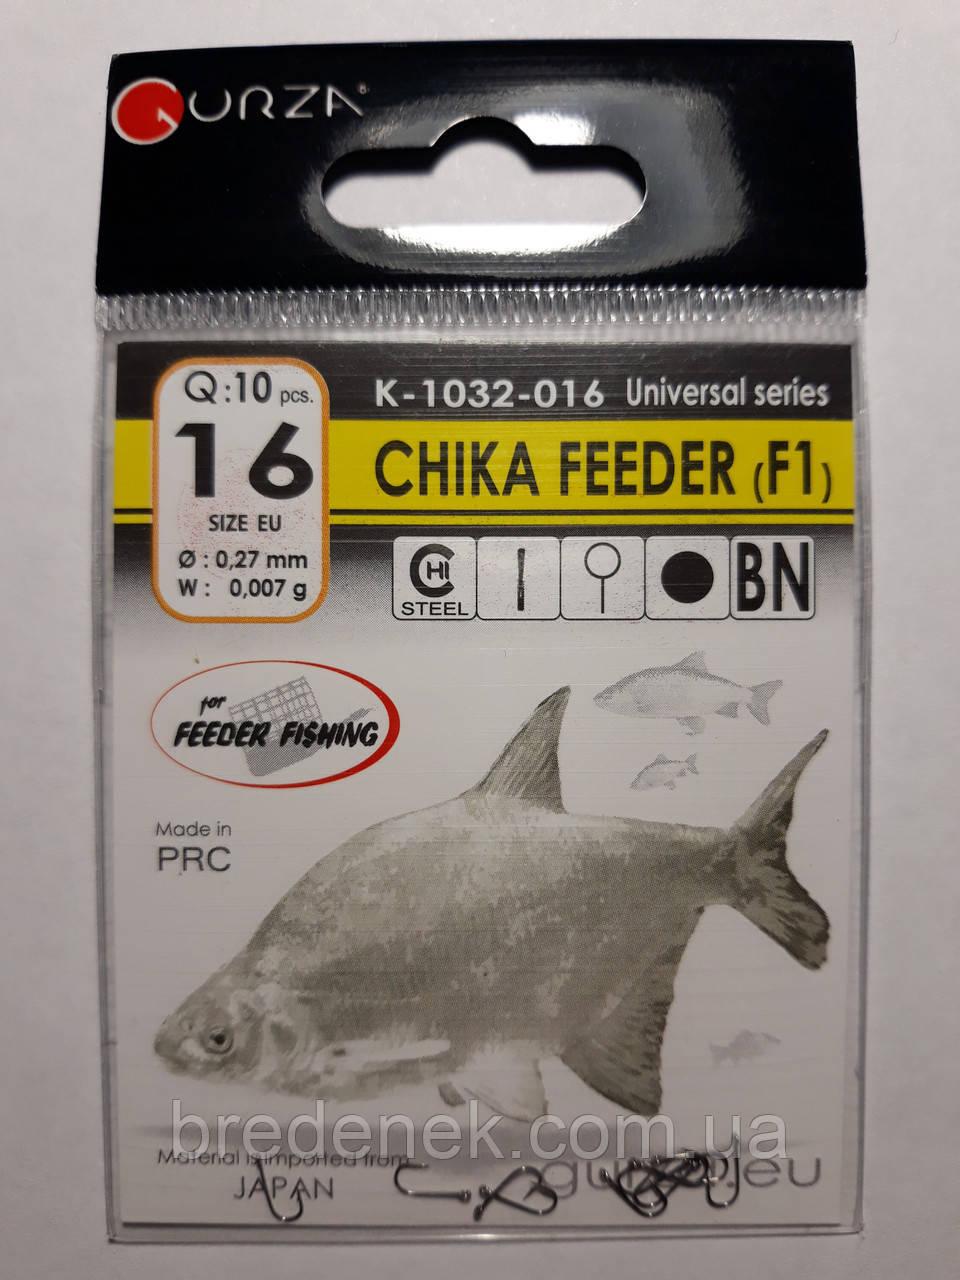 Крючки Gurza chika feeder № 16